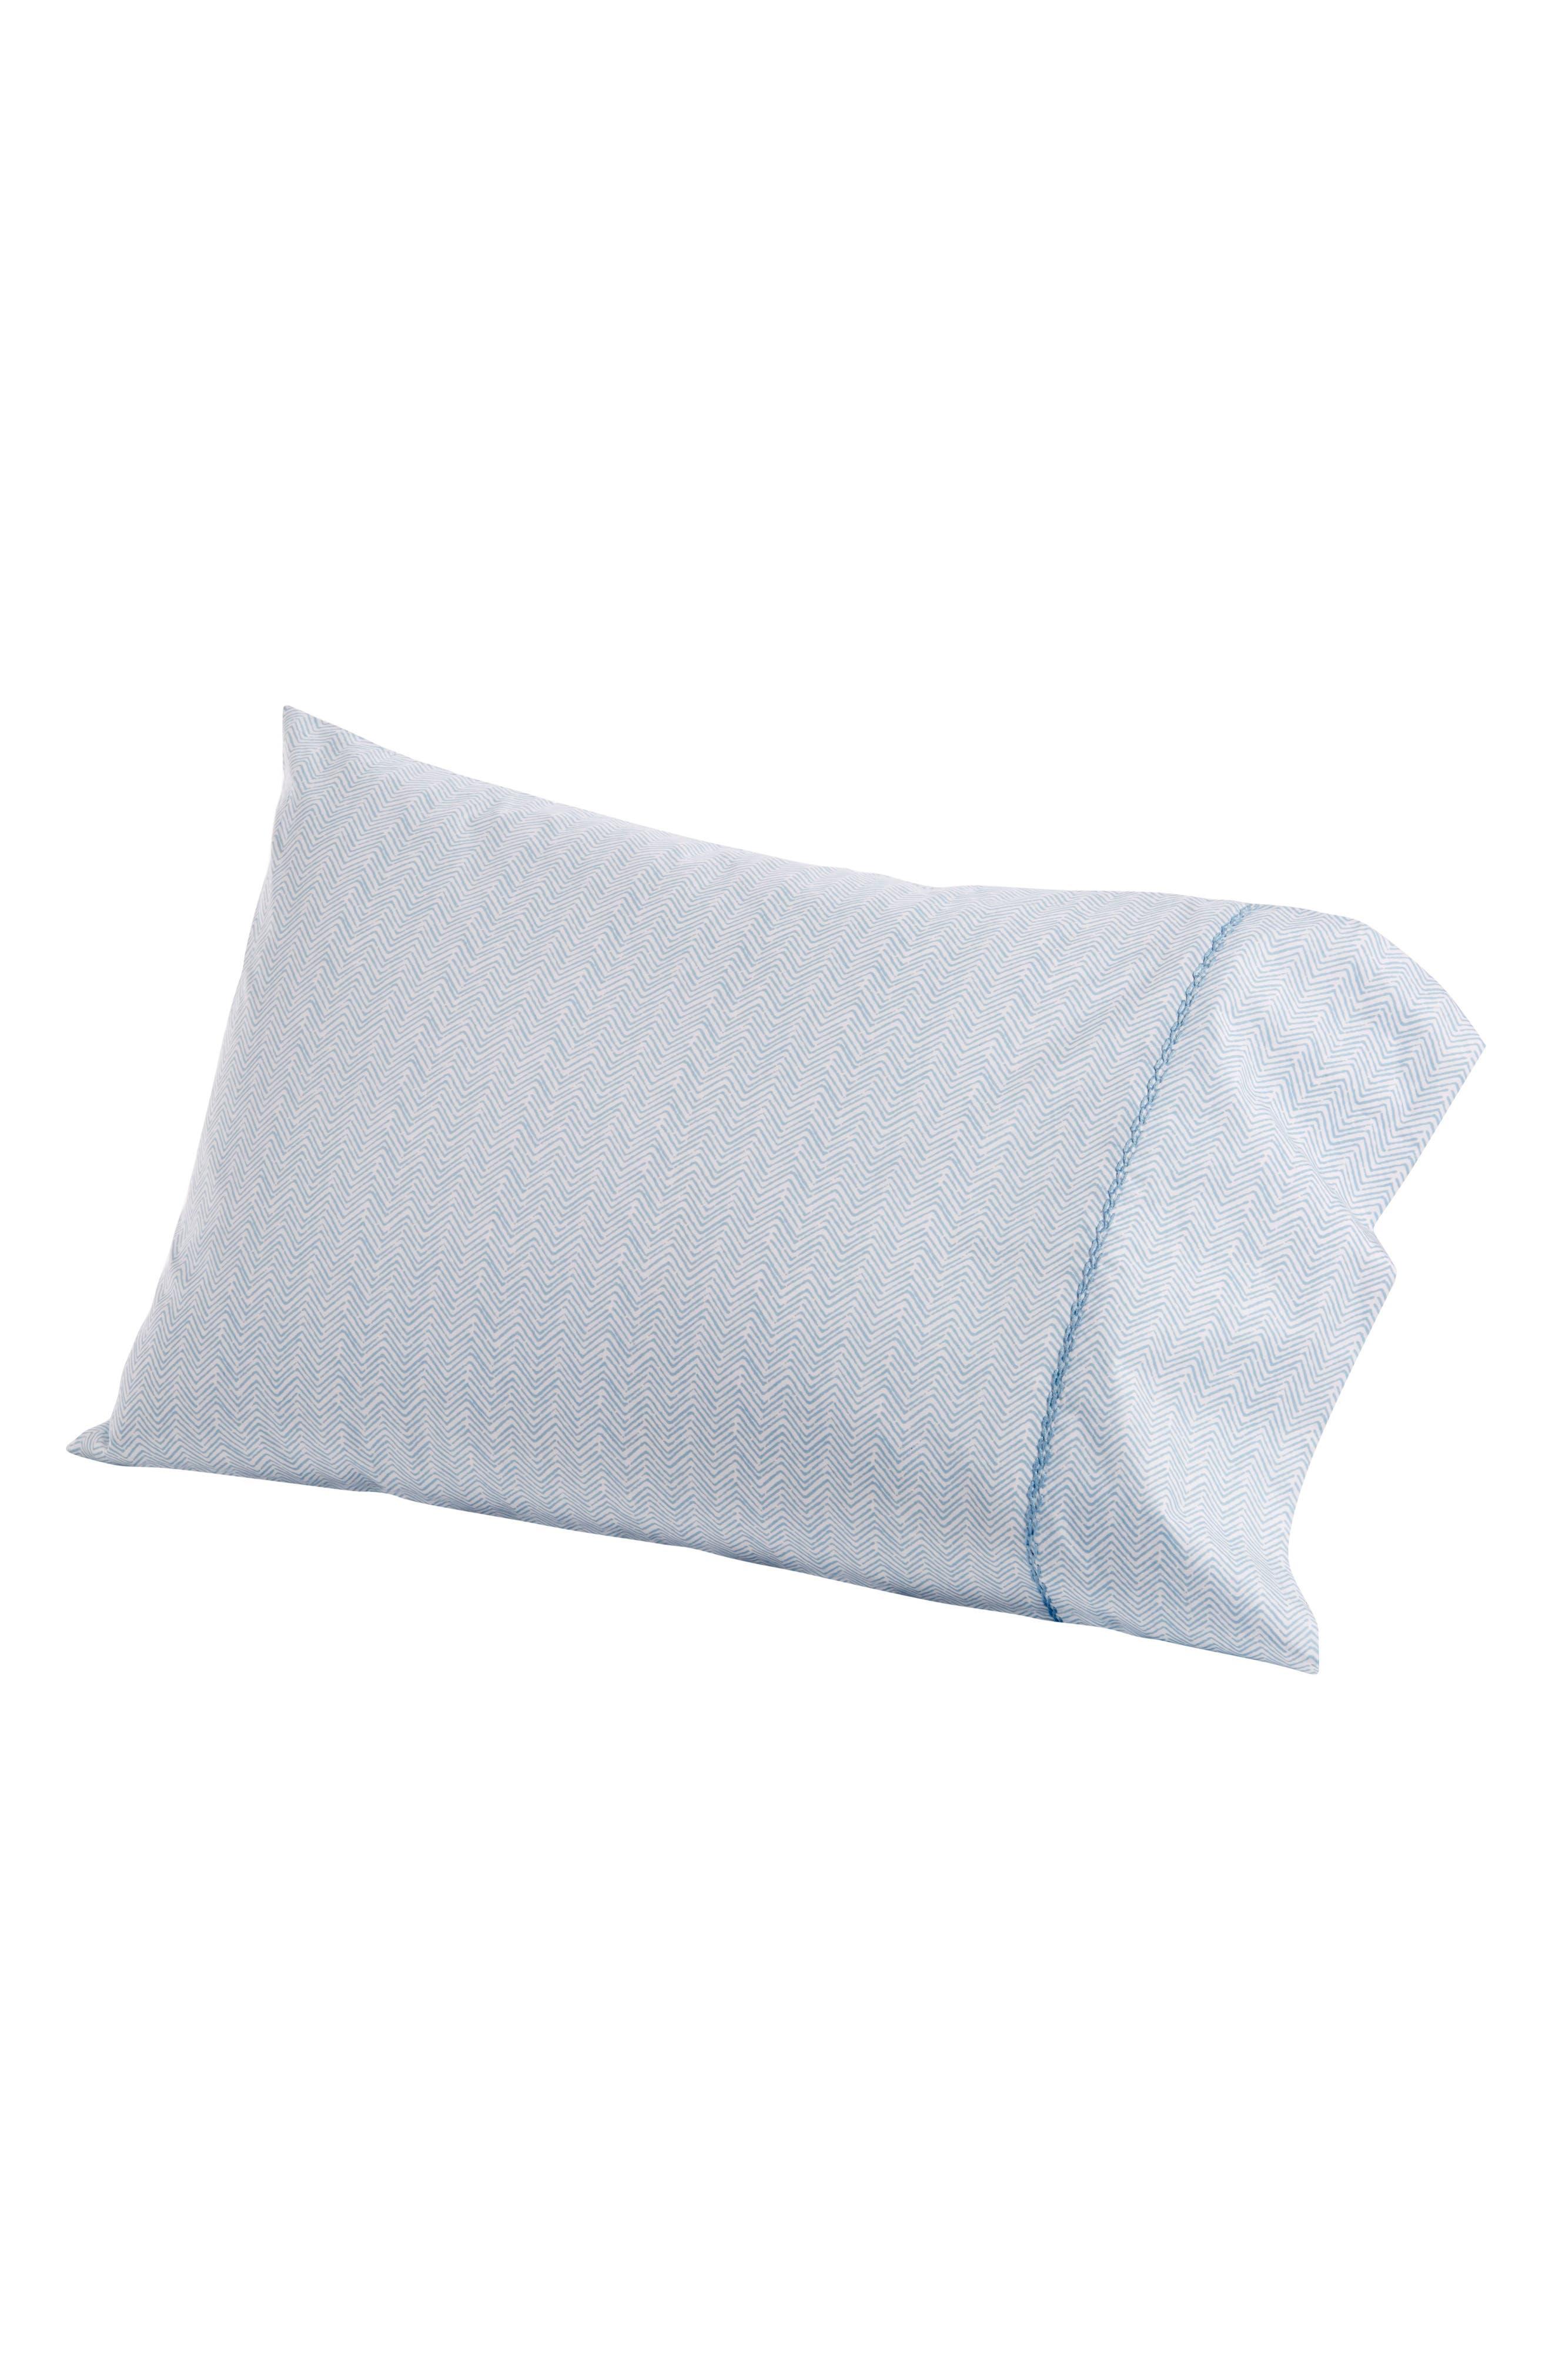 Chevron Combed Cotton Pillowcases,                             Main thumbnail 1, color,                             Light Indigo White